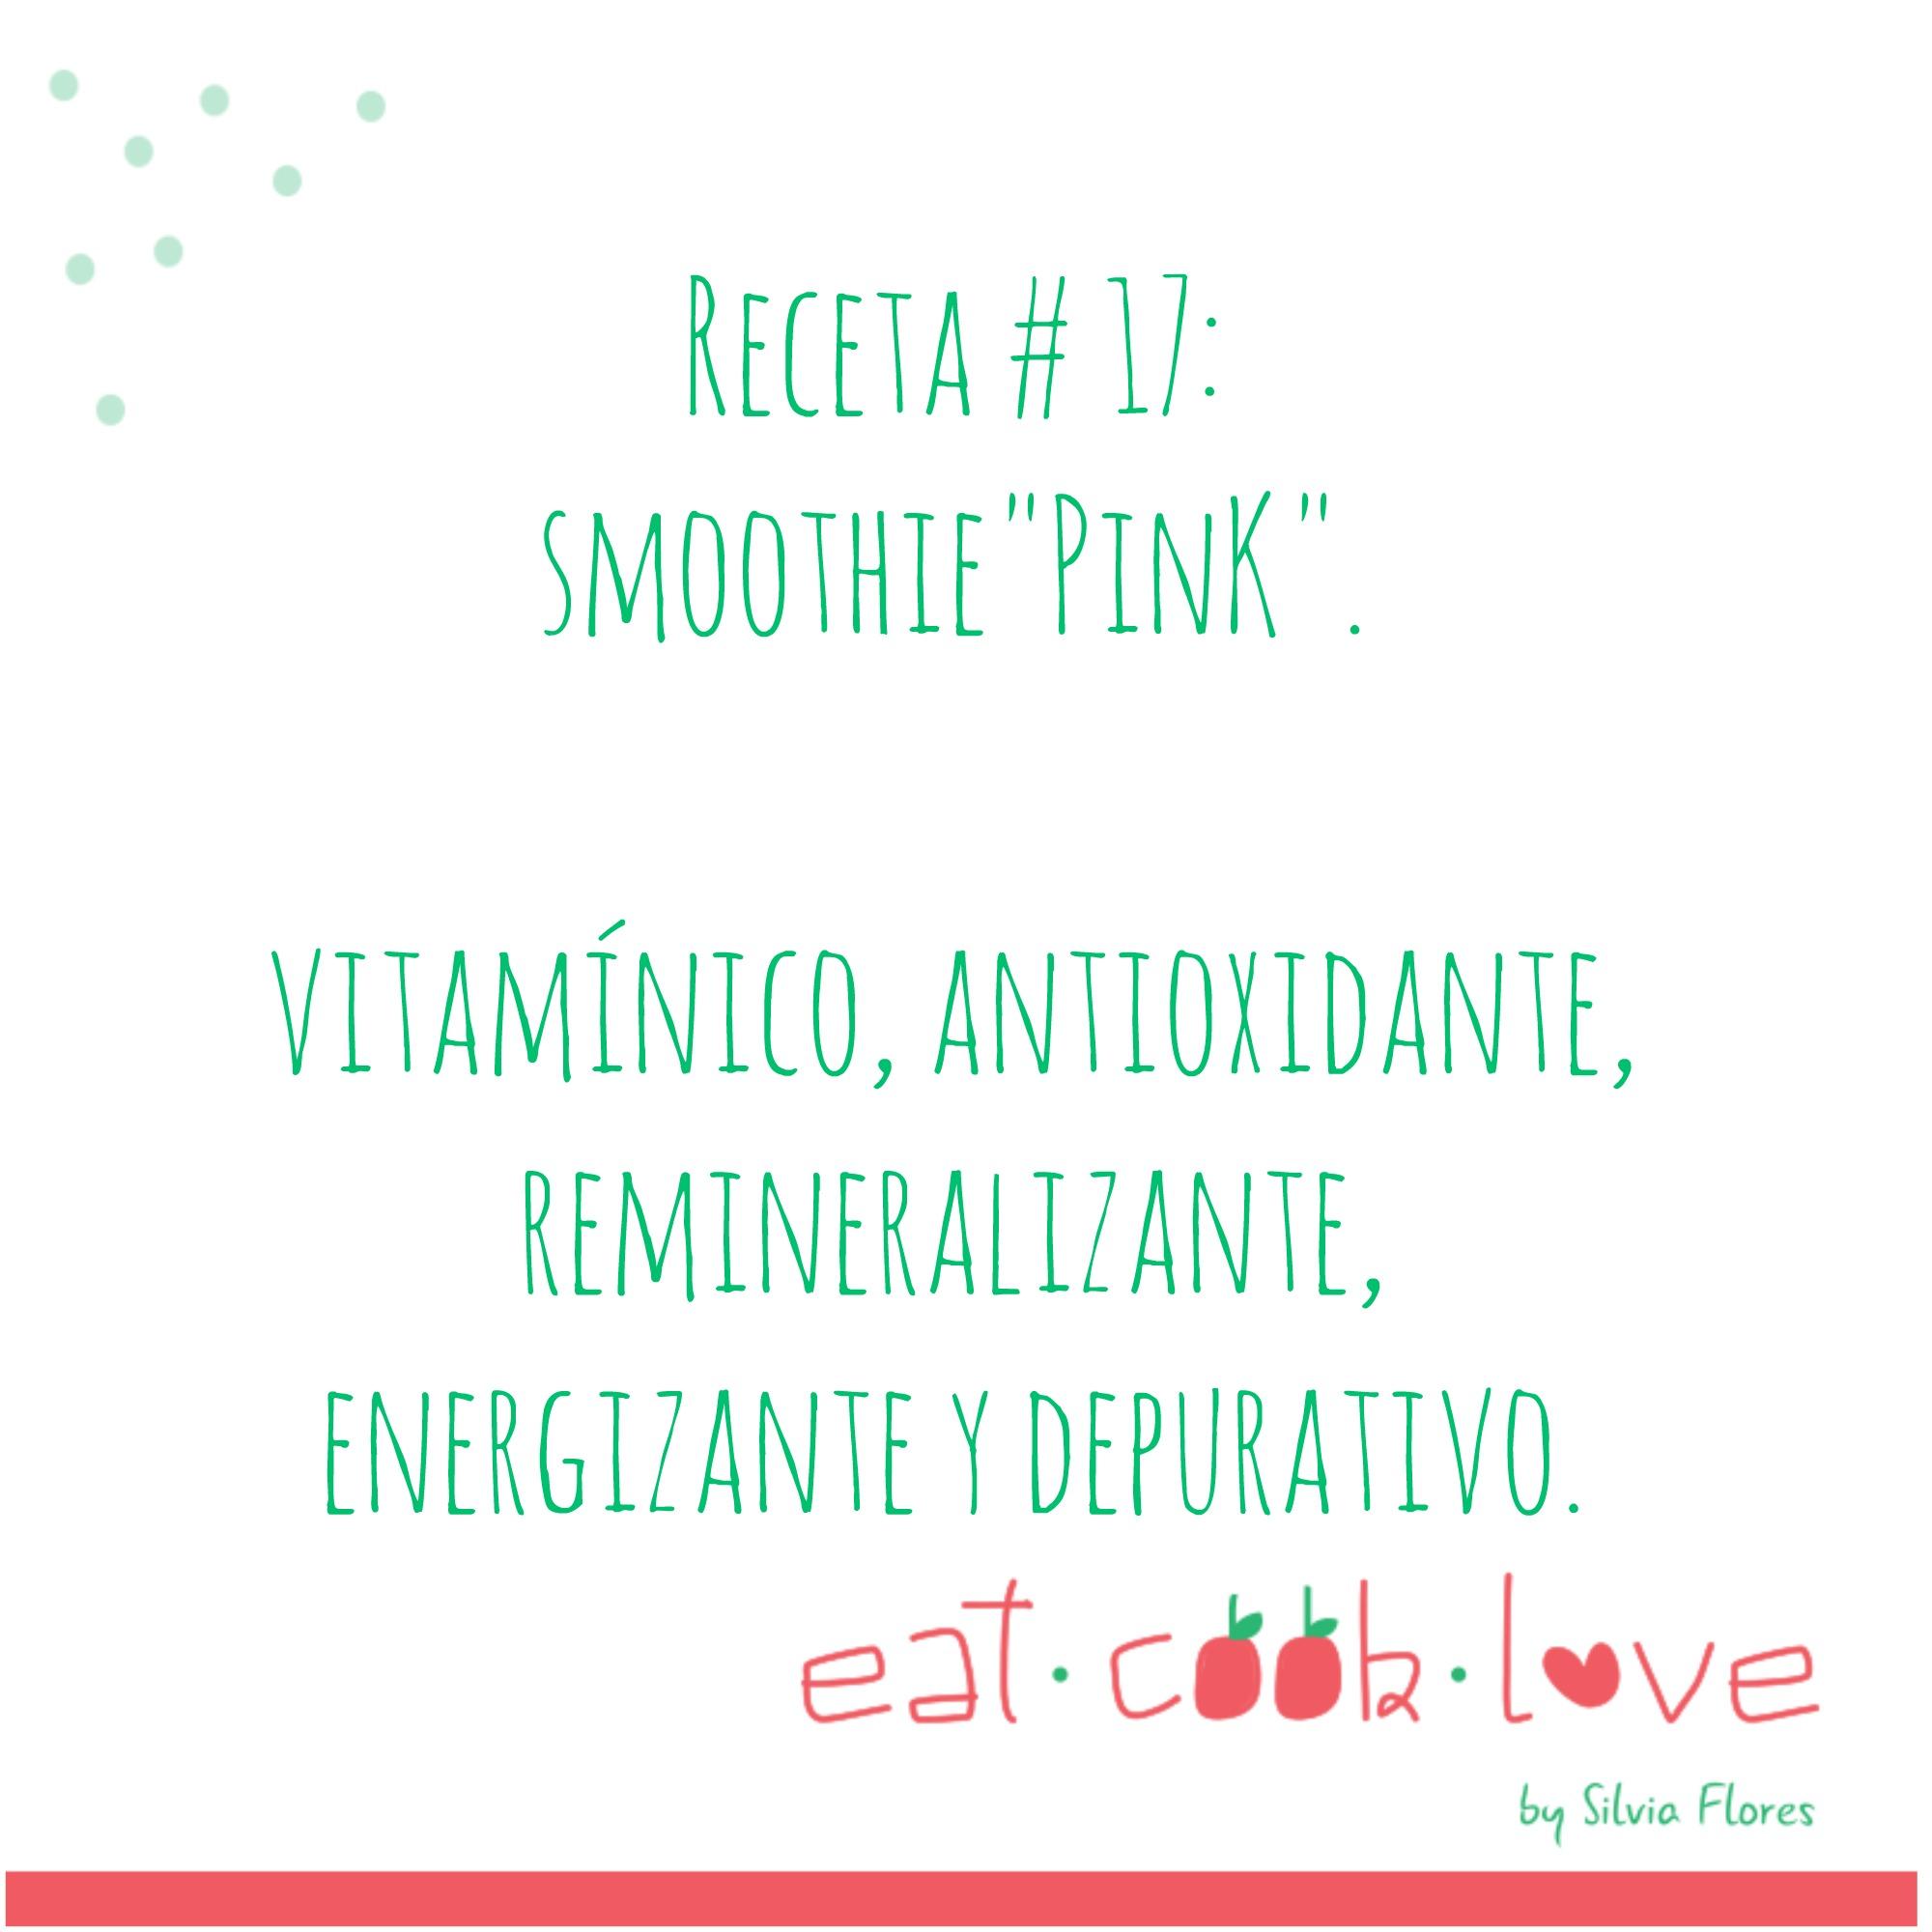 Eat, Cook, Love ®